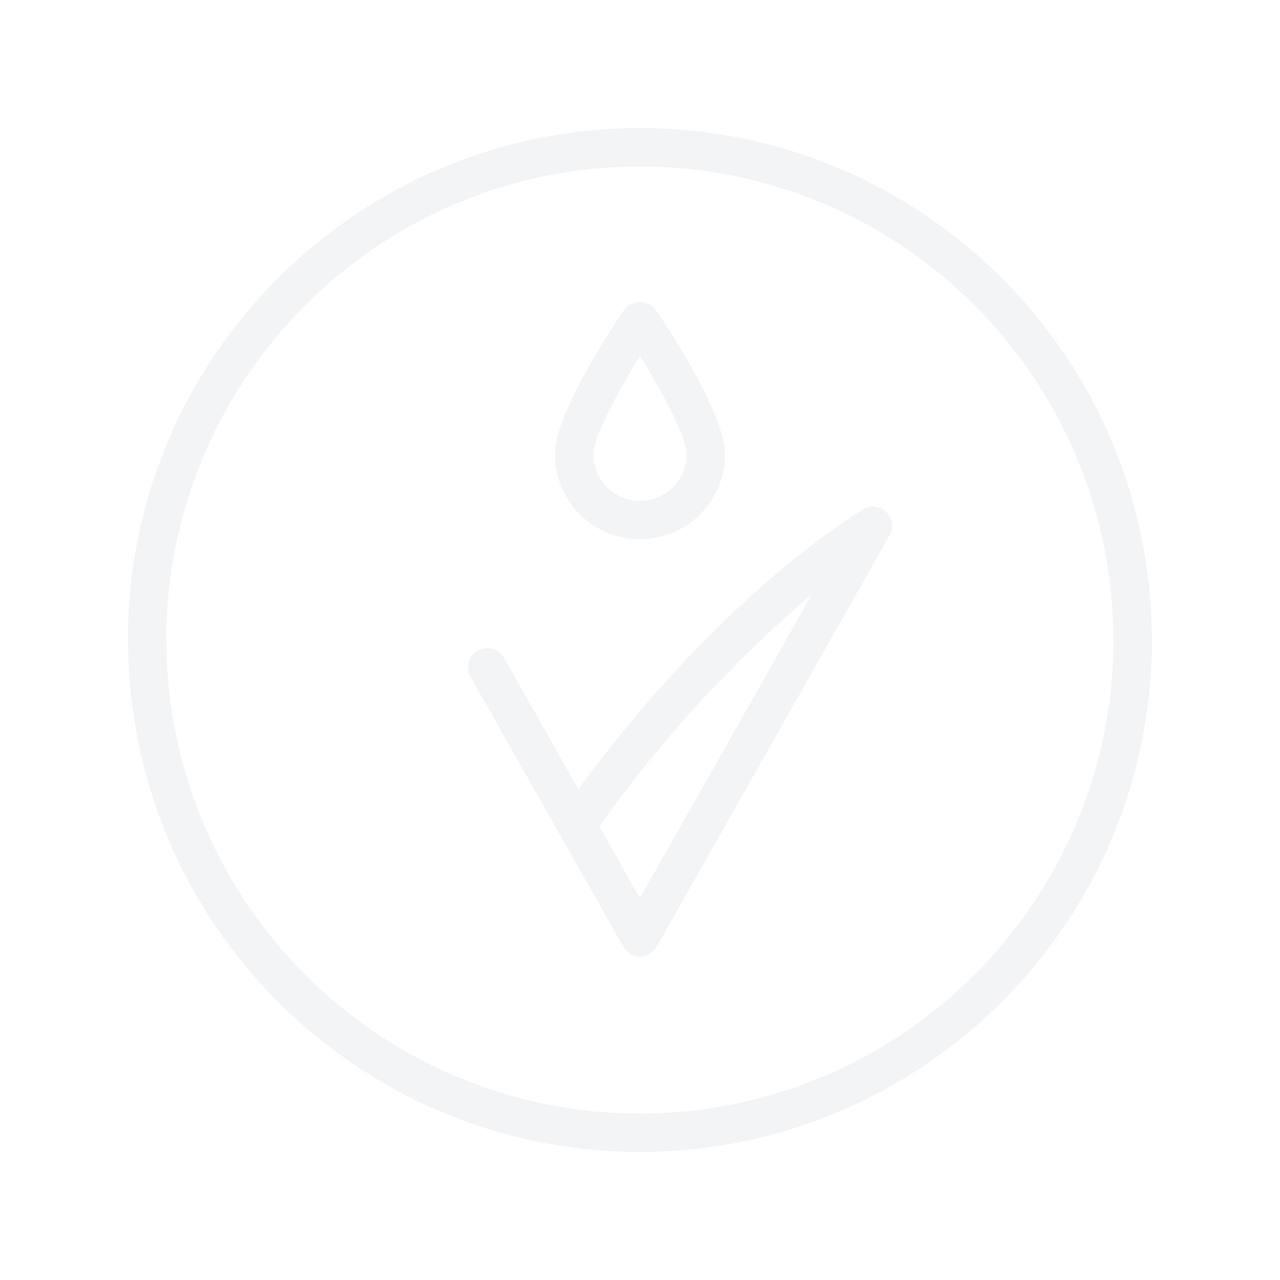 MEXX Whenever Wherever For Her Eau De Toilette